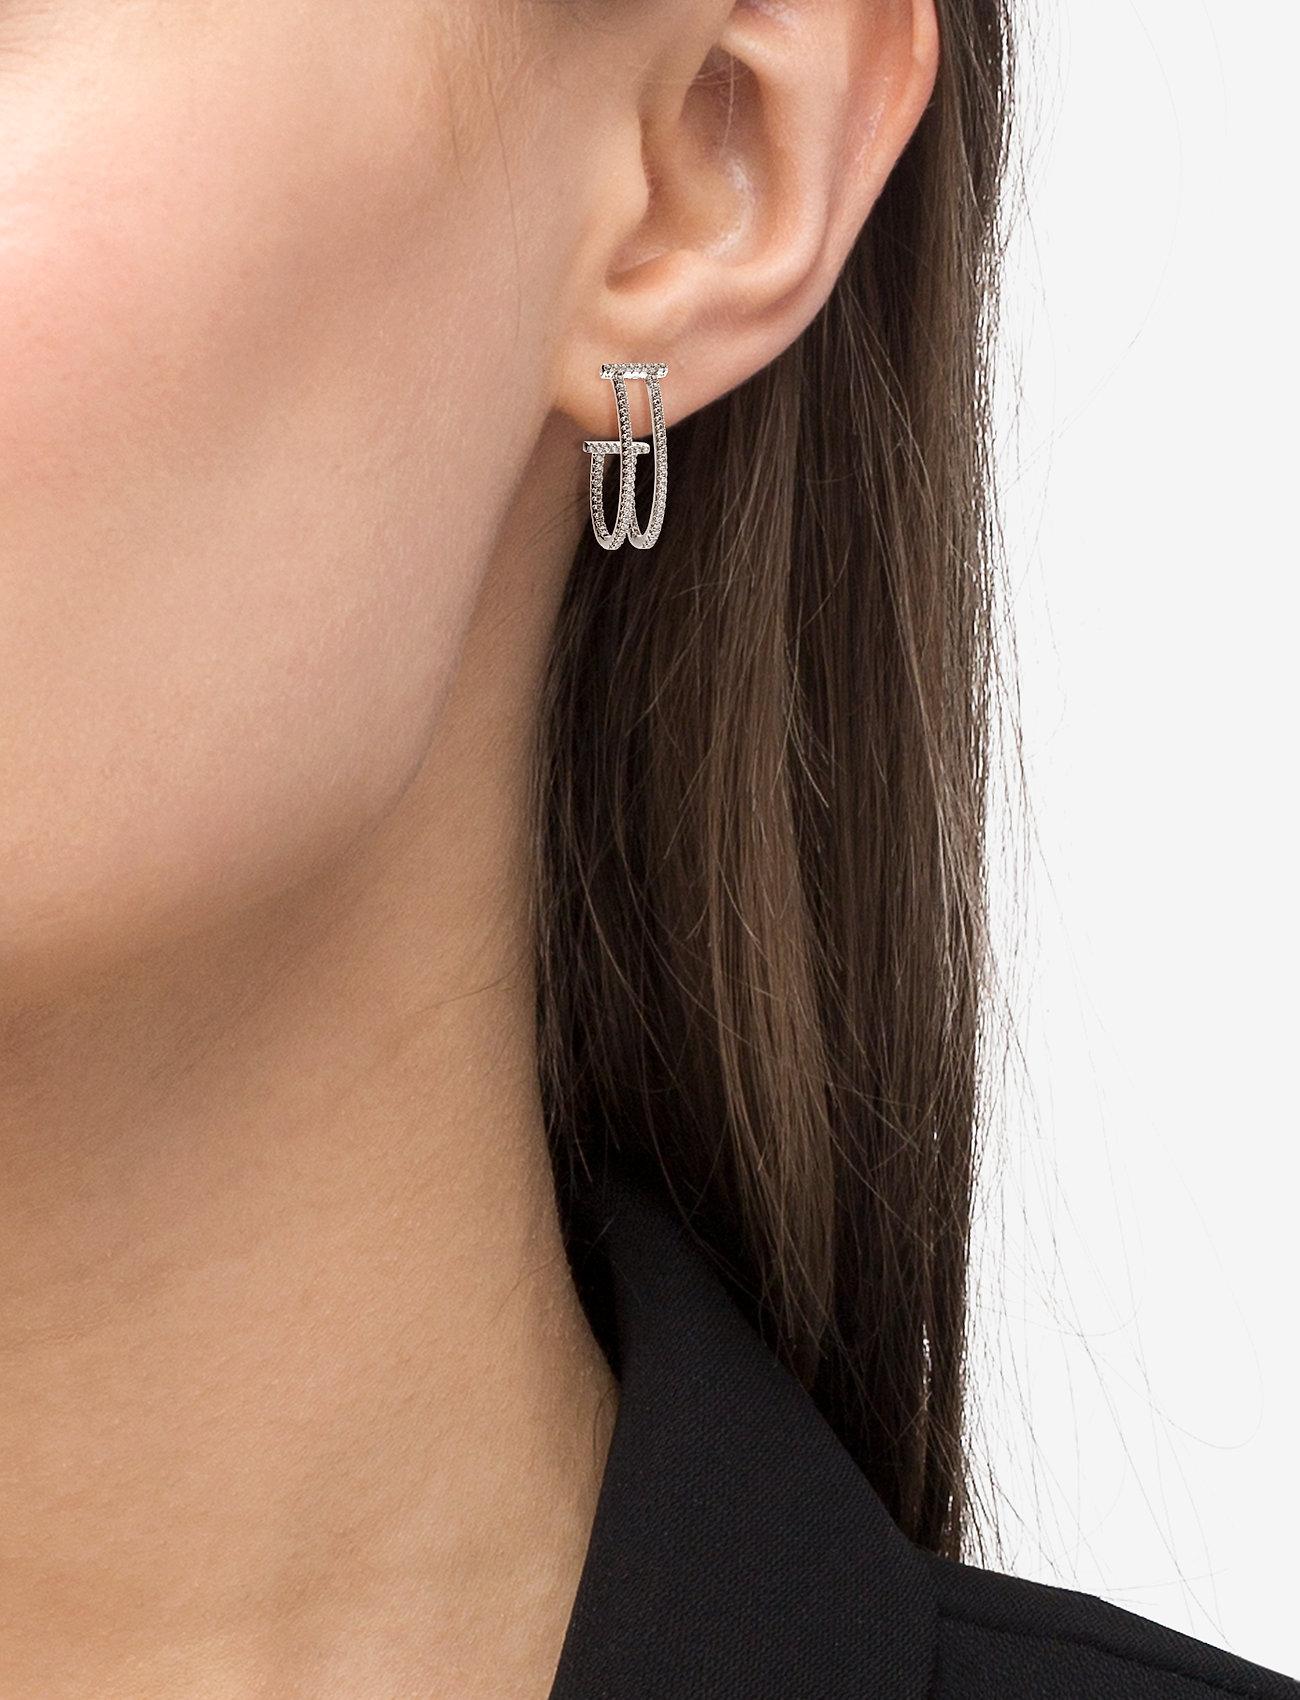 Sif Jakobs Jewellery FUCINO LUNGO EARRINGS - SILVER